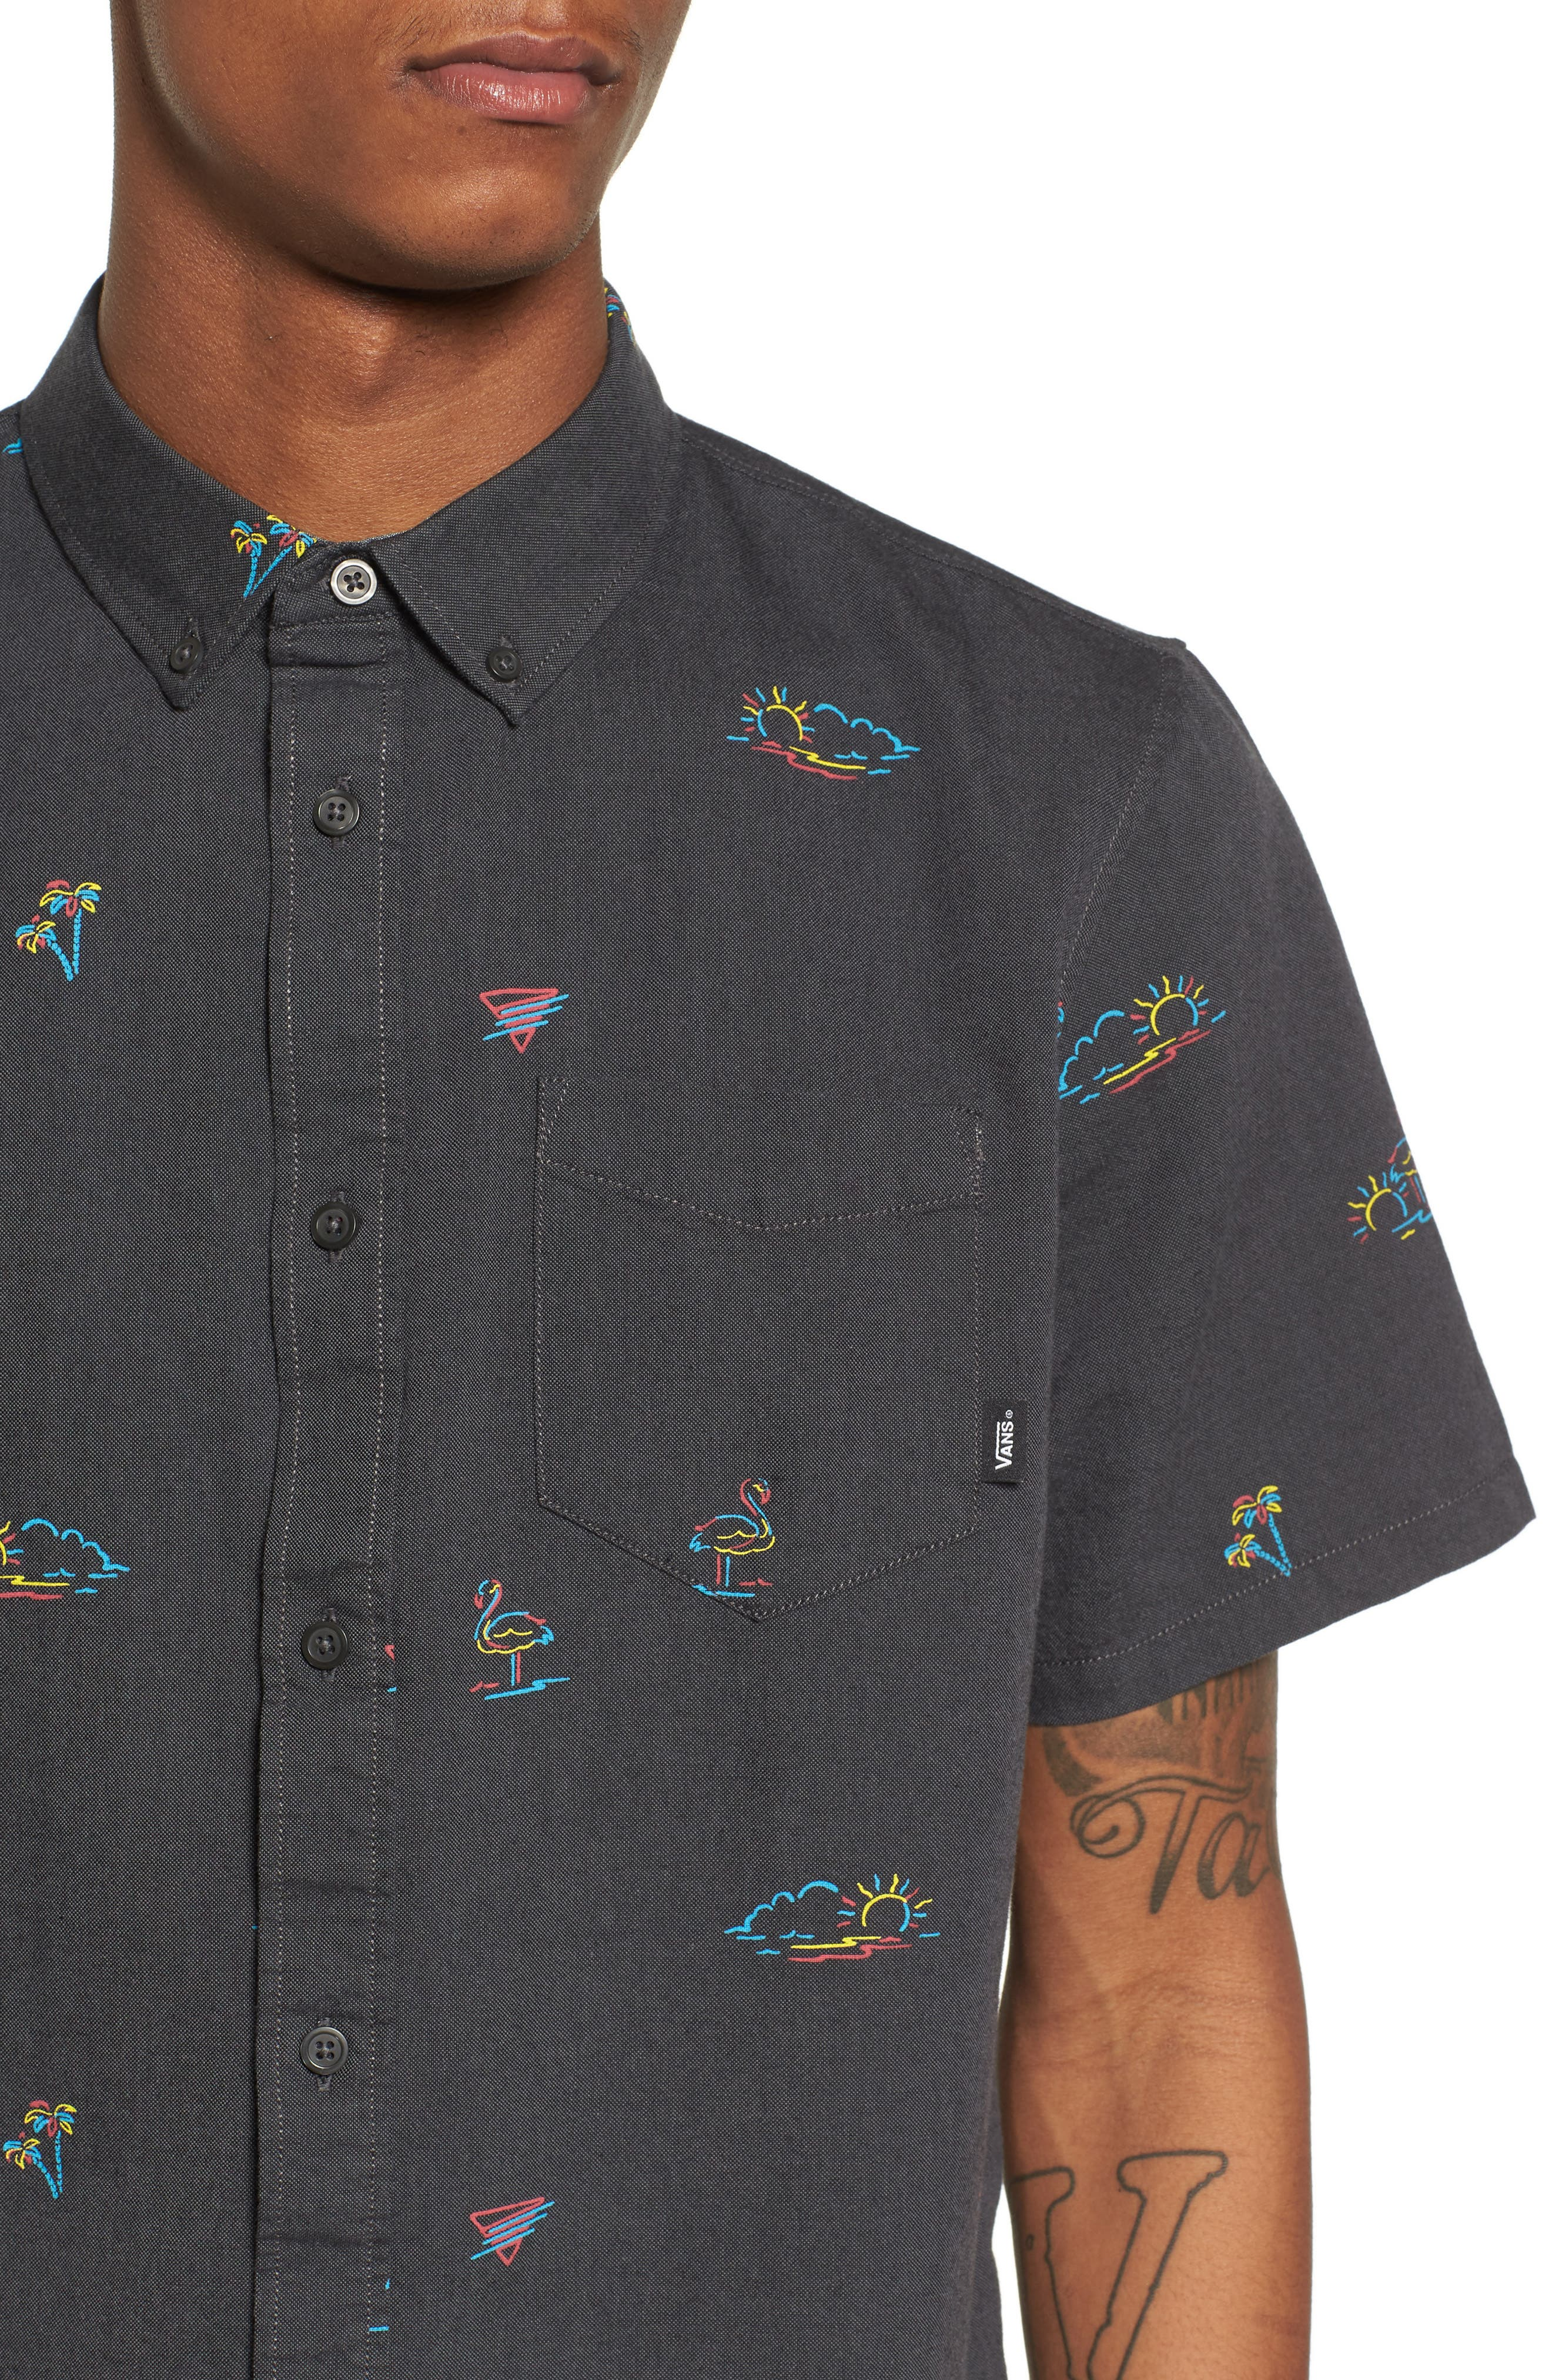 Houser Woven Shirt,                             Alternate thumbnail 2, color,                             Black Road Trippin